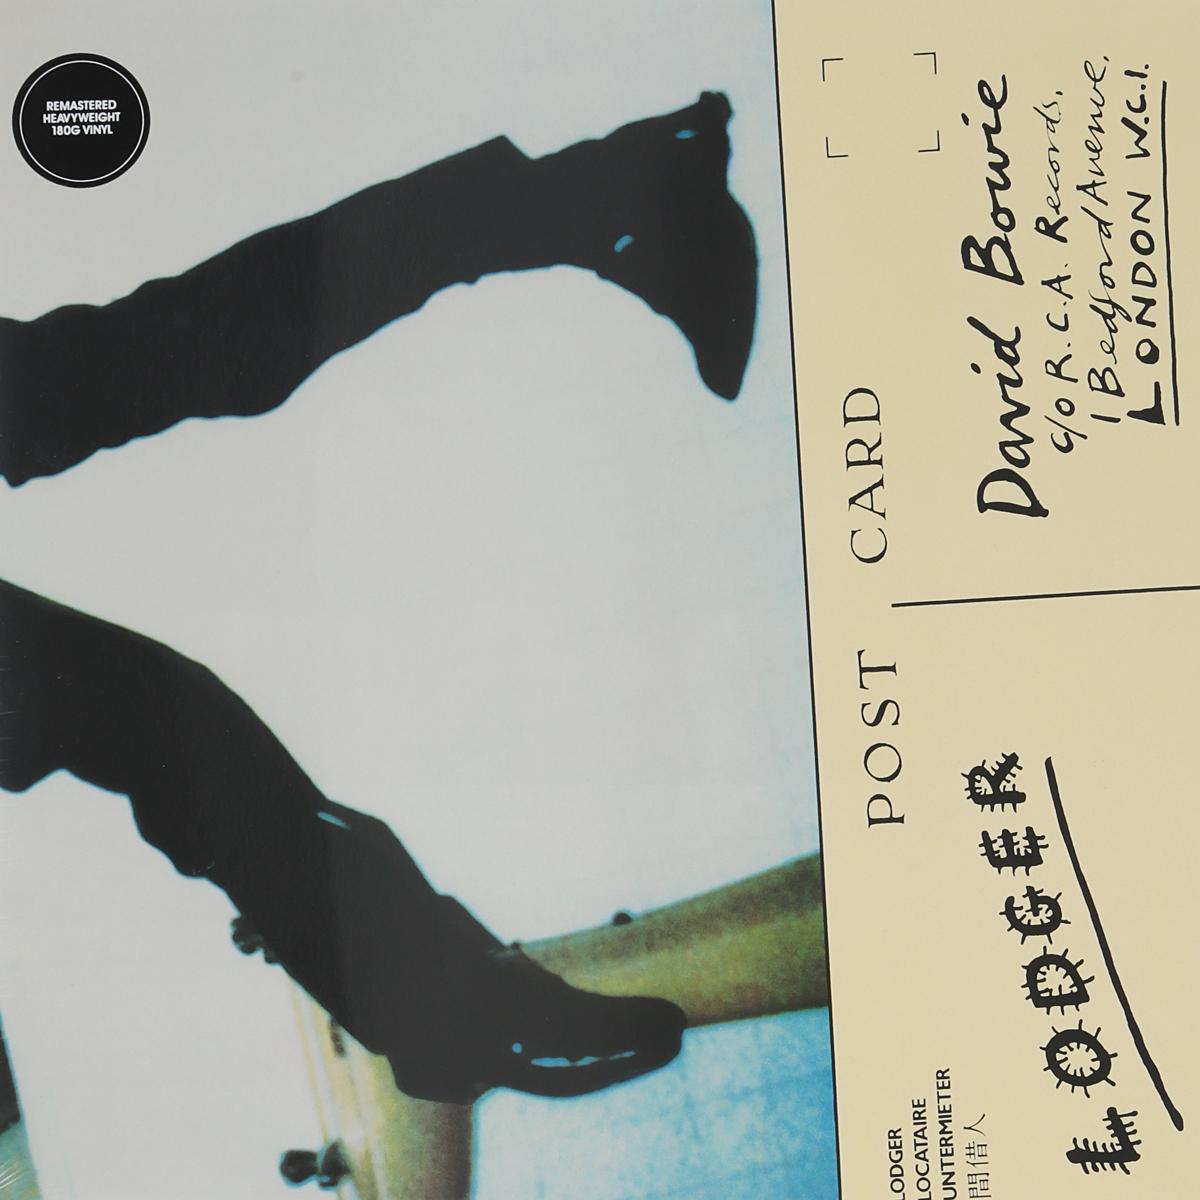 Дэвид Боуи David Bowie. Lodger. Remastered Version (LP) цена